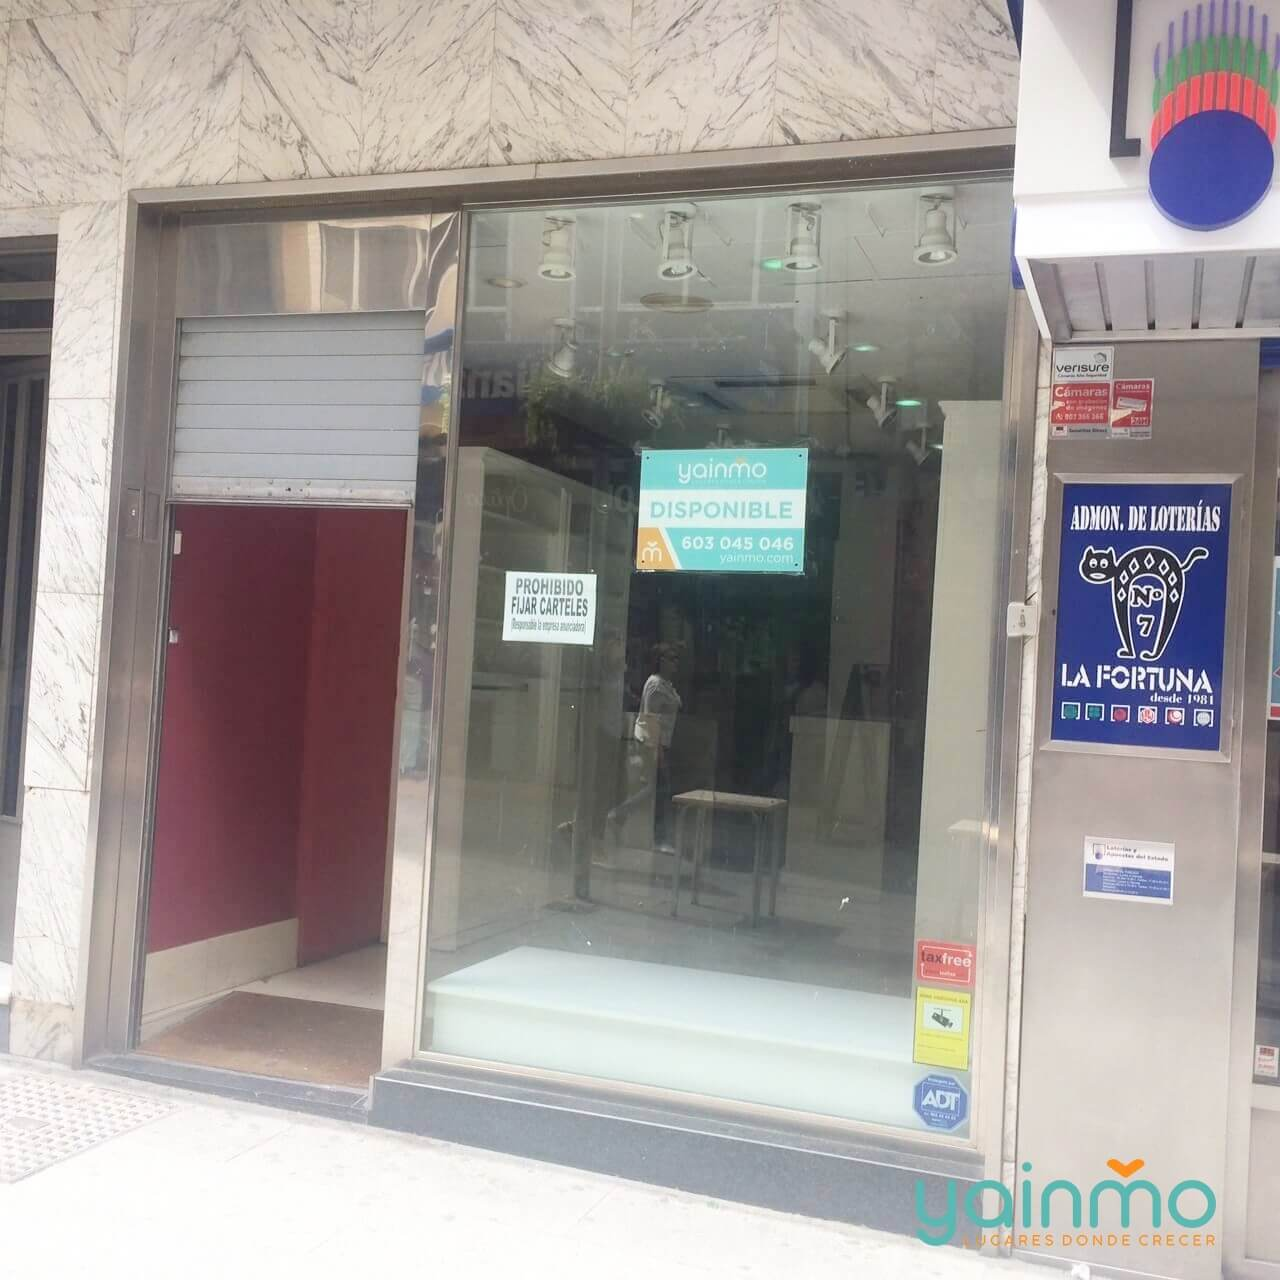 Local Rent Homes: Local Rent Jaén Yainmo-134